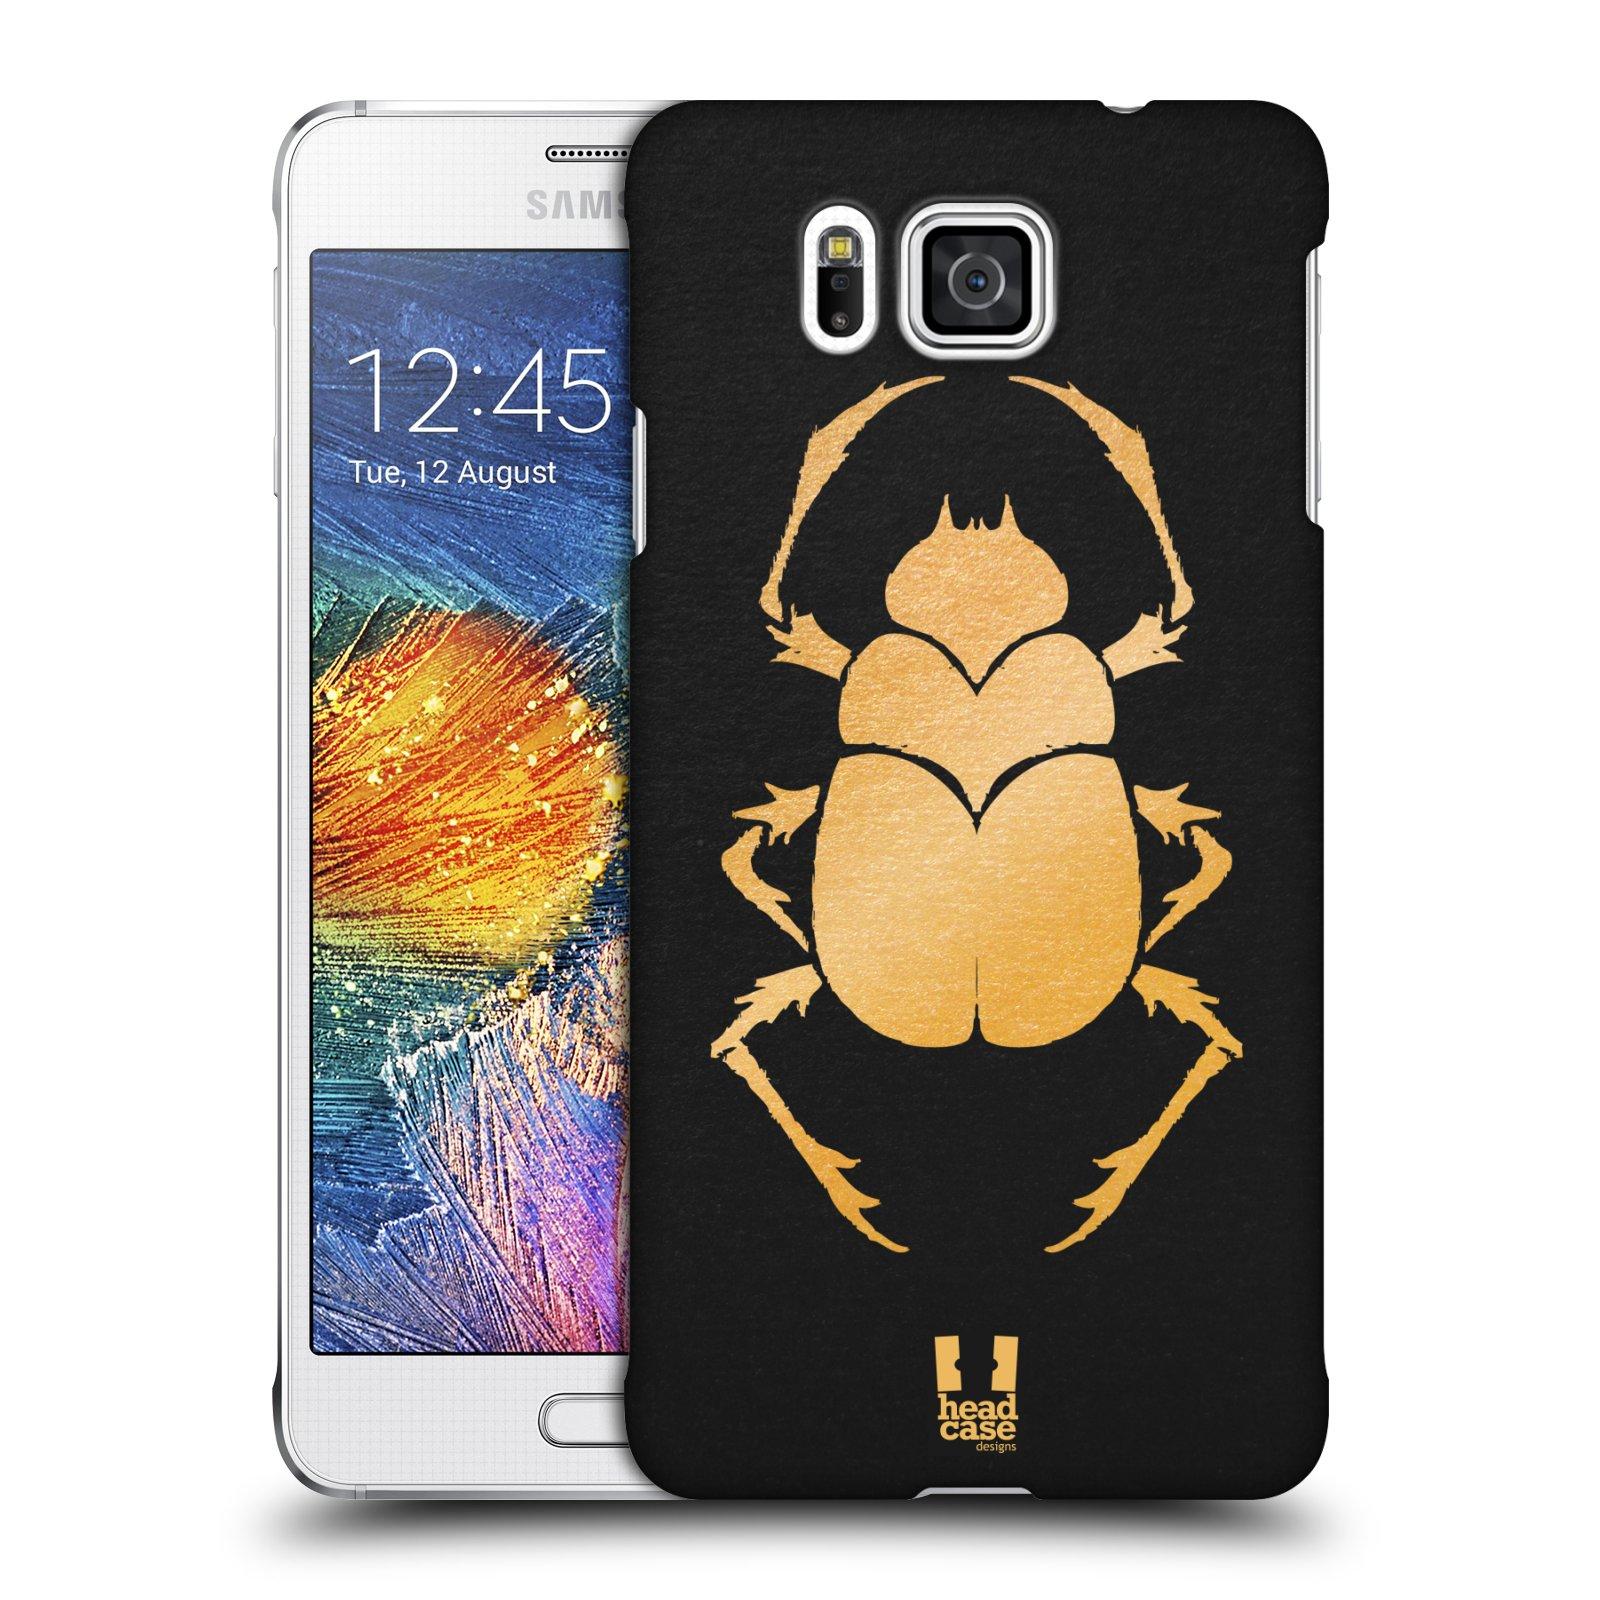 Plastové pouzdro na mobil Samsung Galaxy Alpha HEAD CASE EGYPT SCARABEUS (Kryt či obal na mobilní telefon Samsung Galaxy Alpha SM-G850)